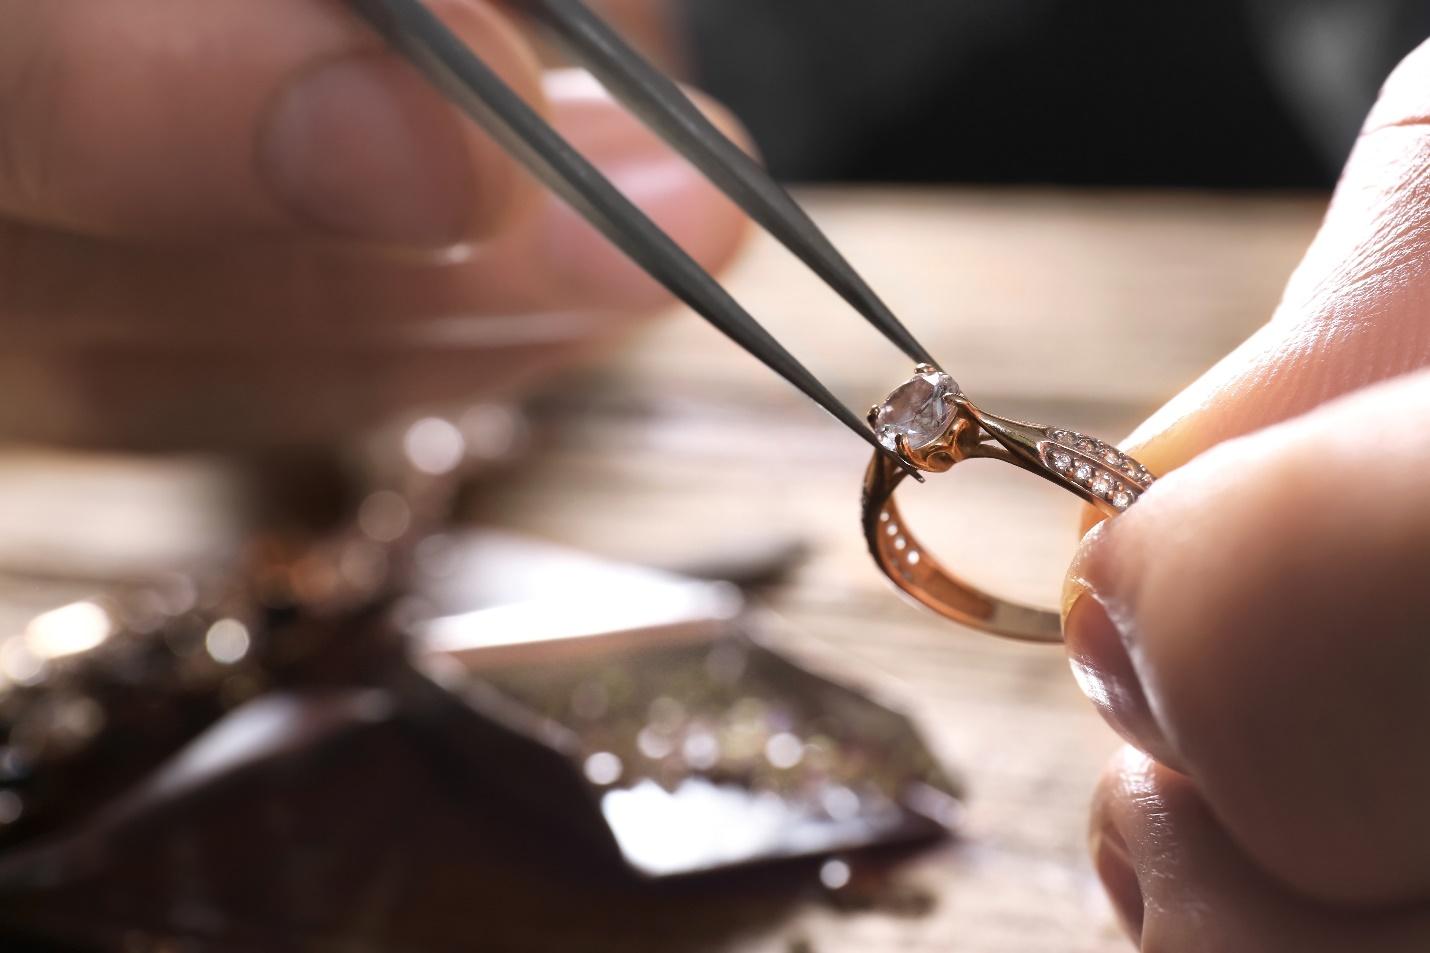 jeweler removing diamond from mount